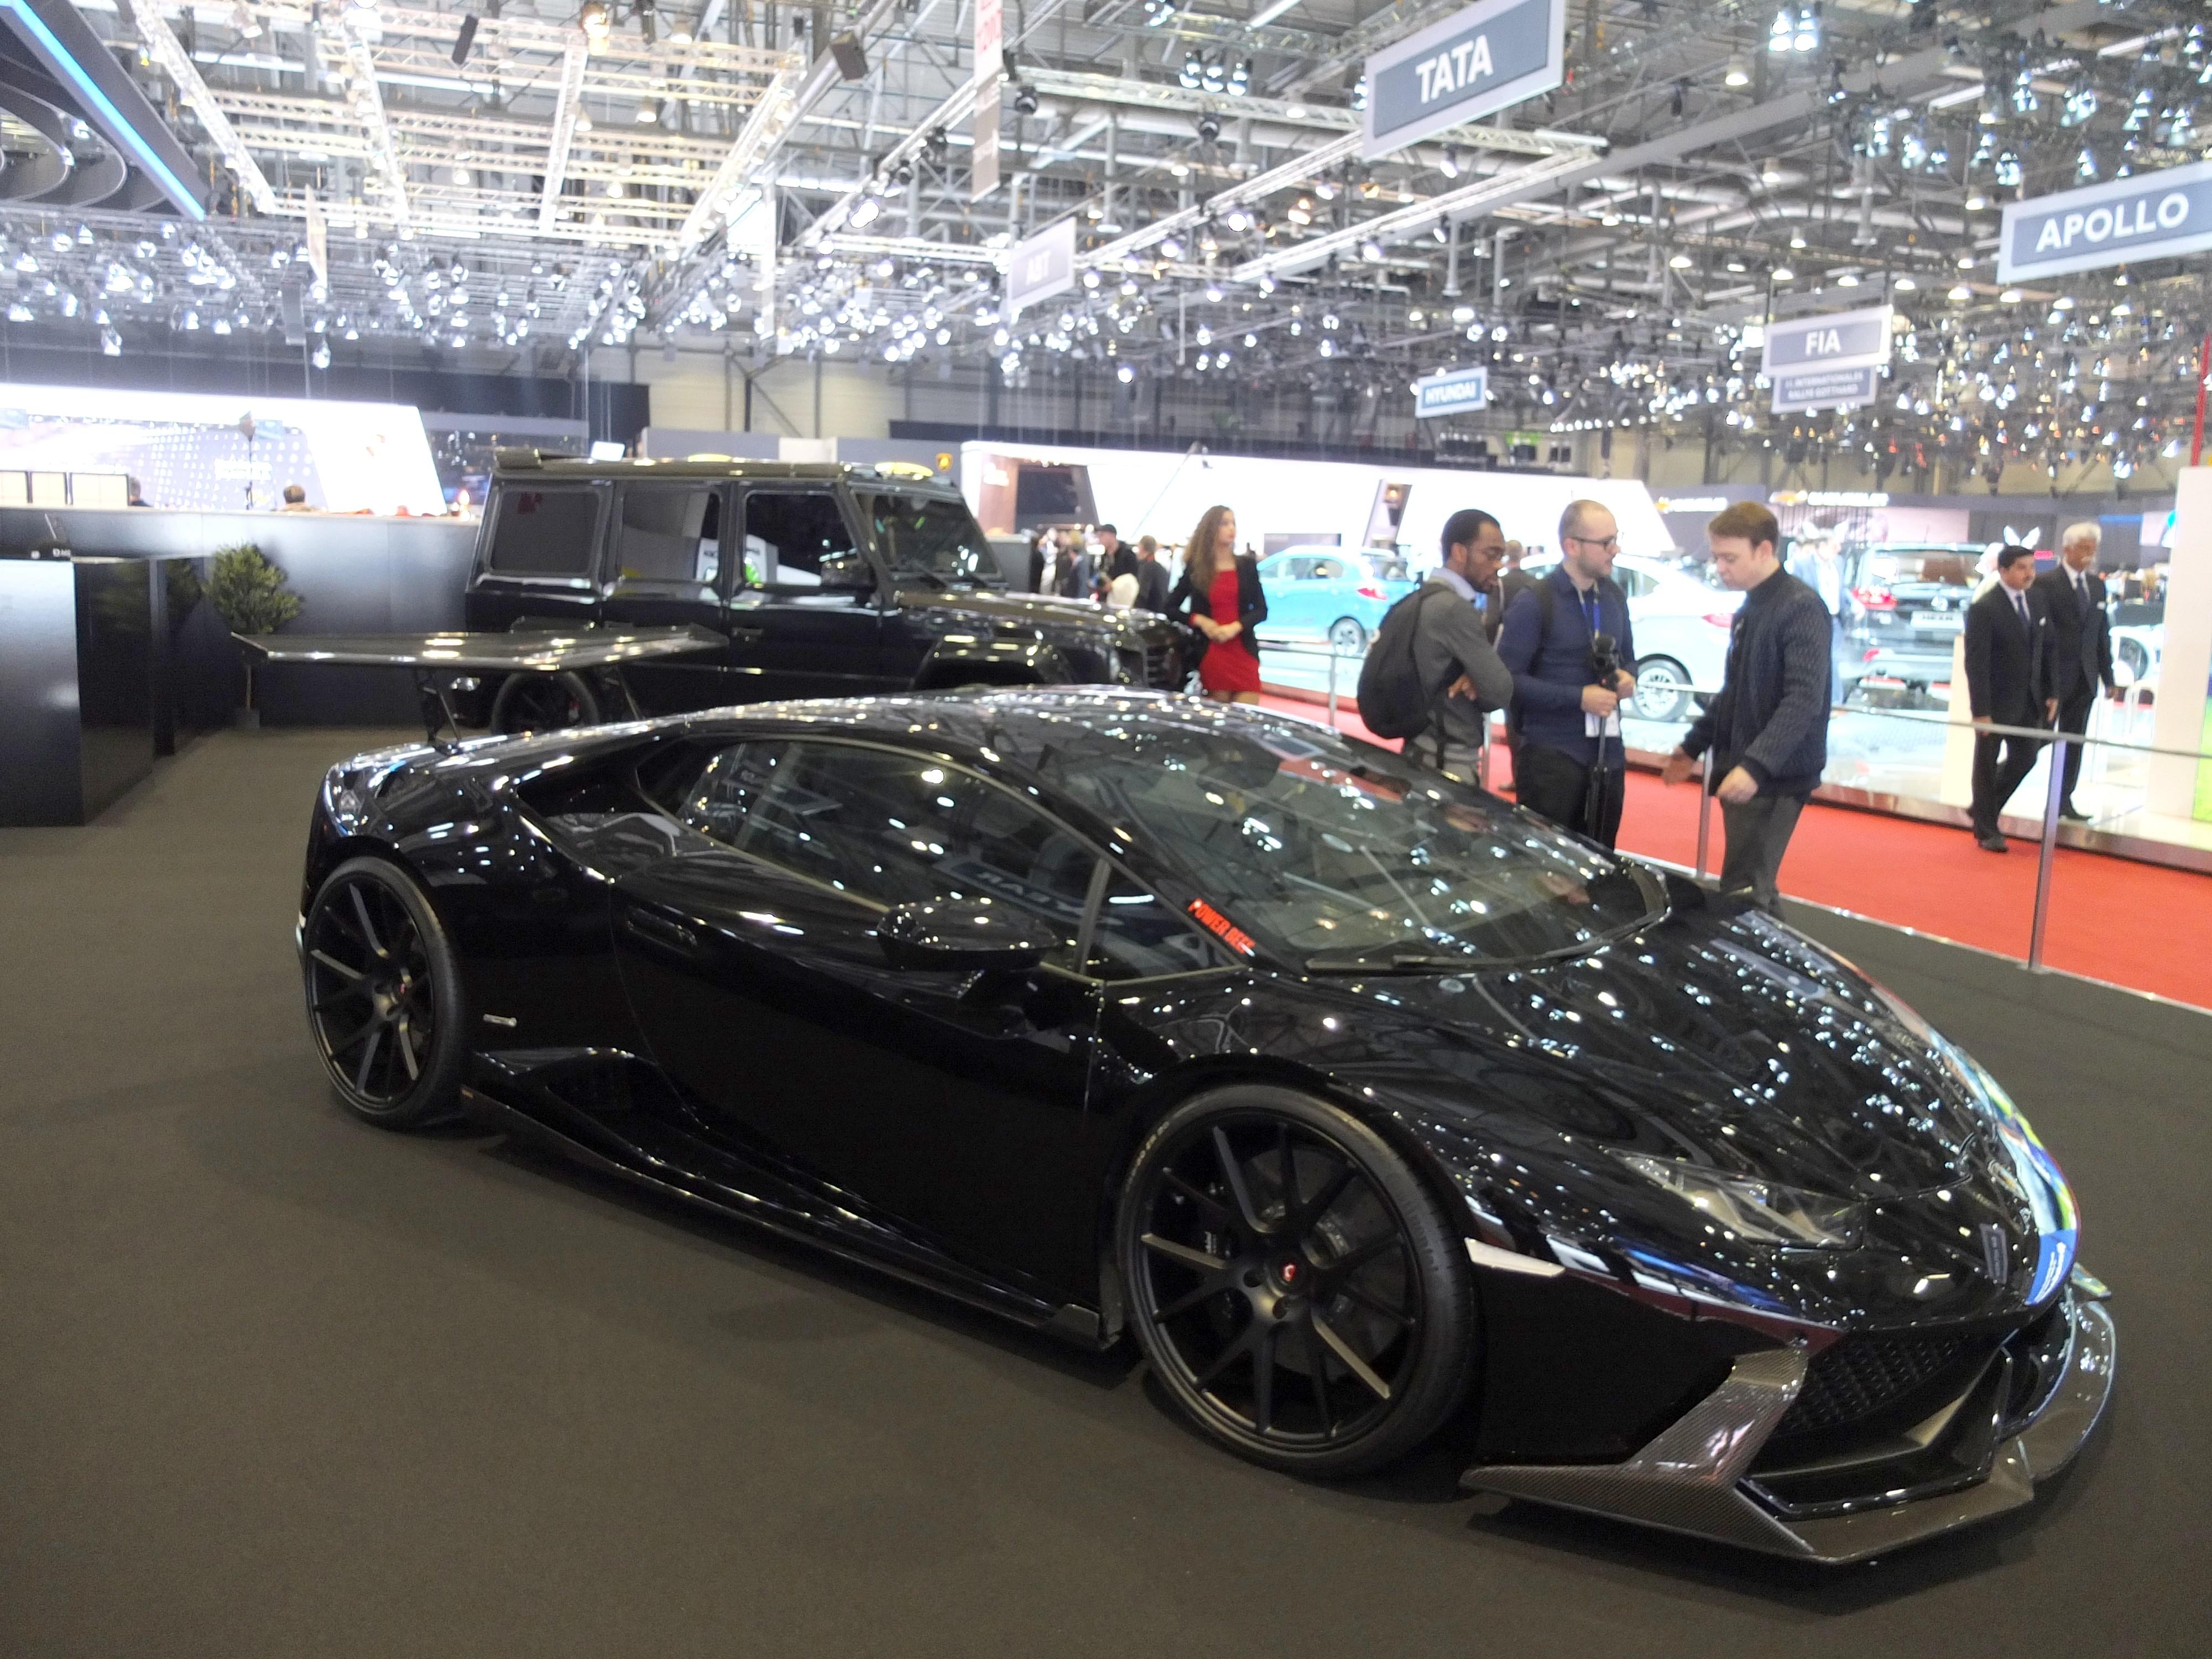 geneve 2016 supercars v hicules exotiques pr parateurs miss 280ch. Black Bedroom Furniture Sets. Home Design Ideas